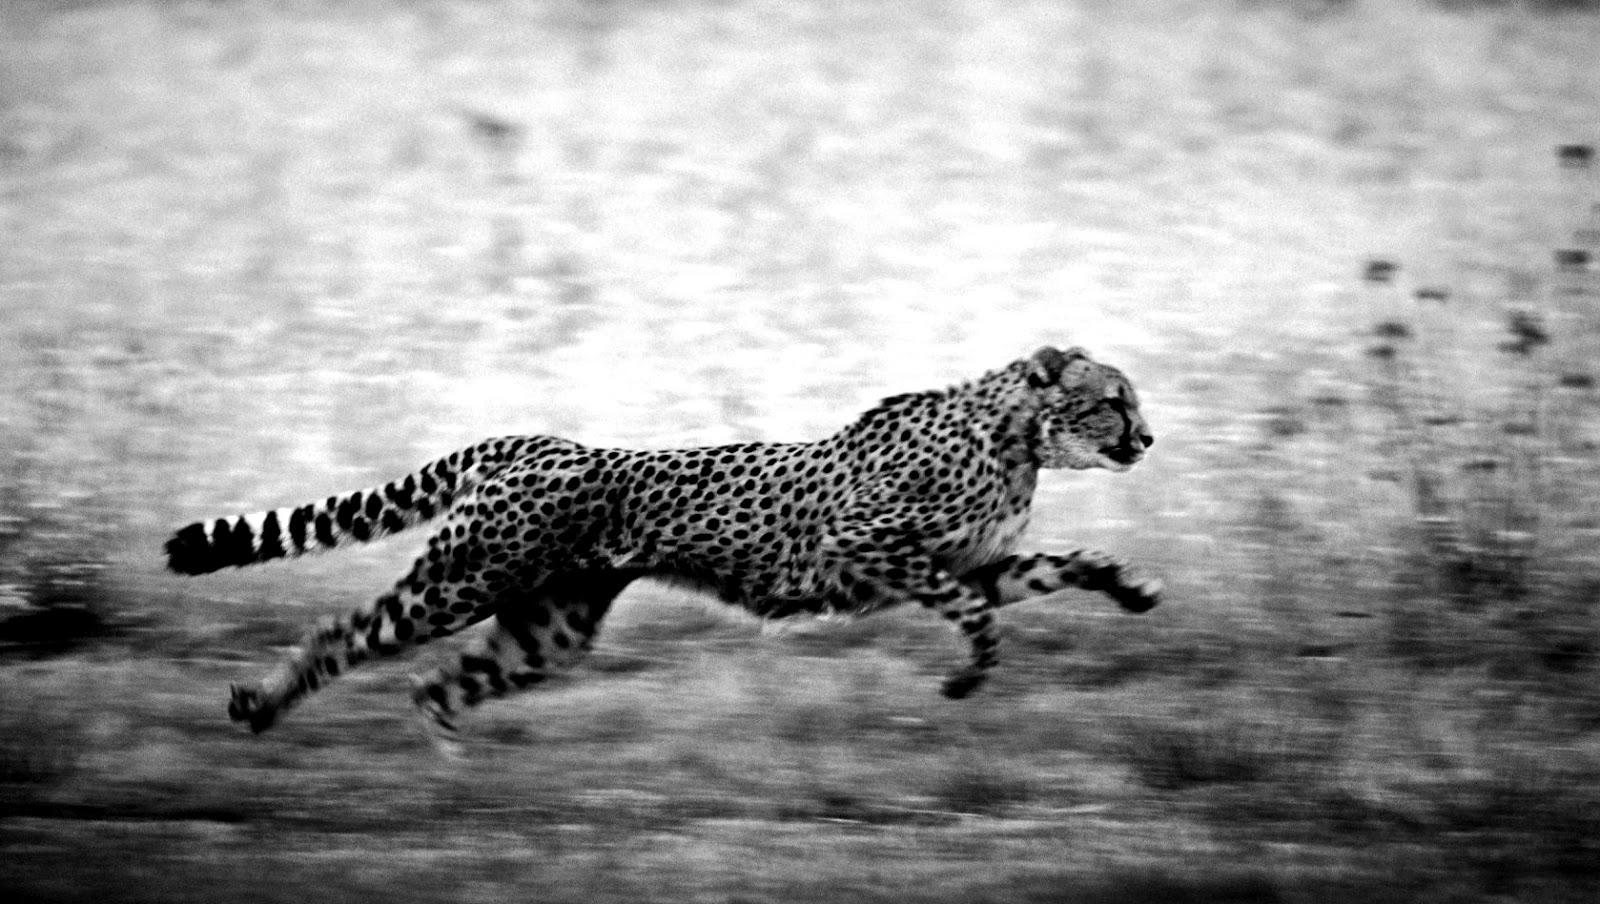 Photography cheetah black and white catalog photo